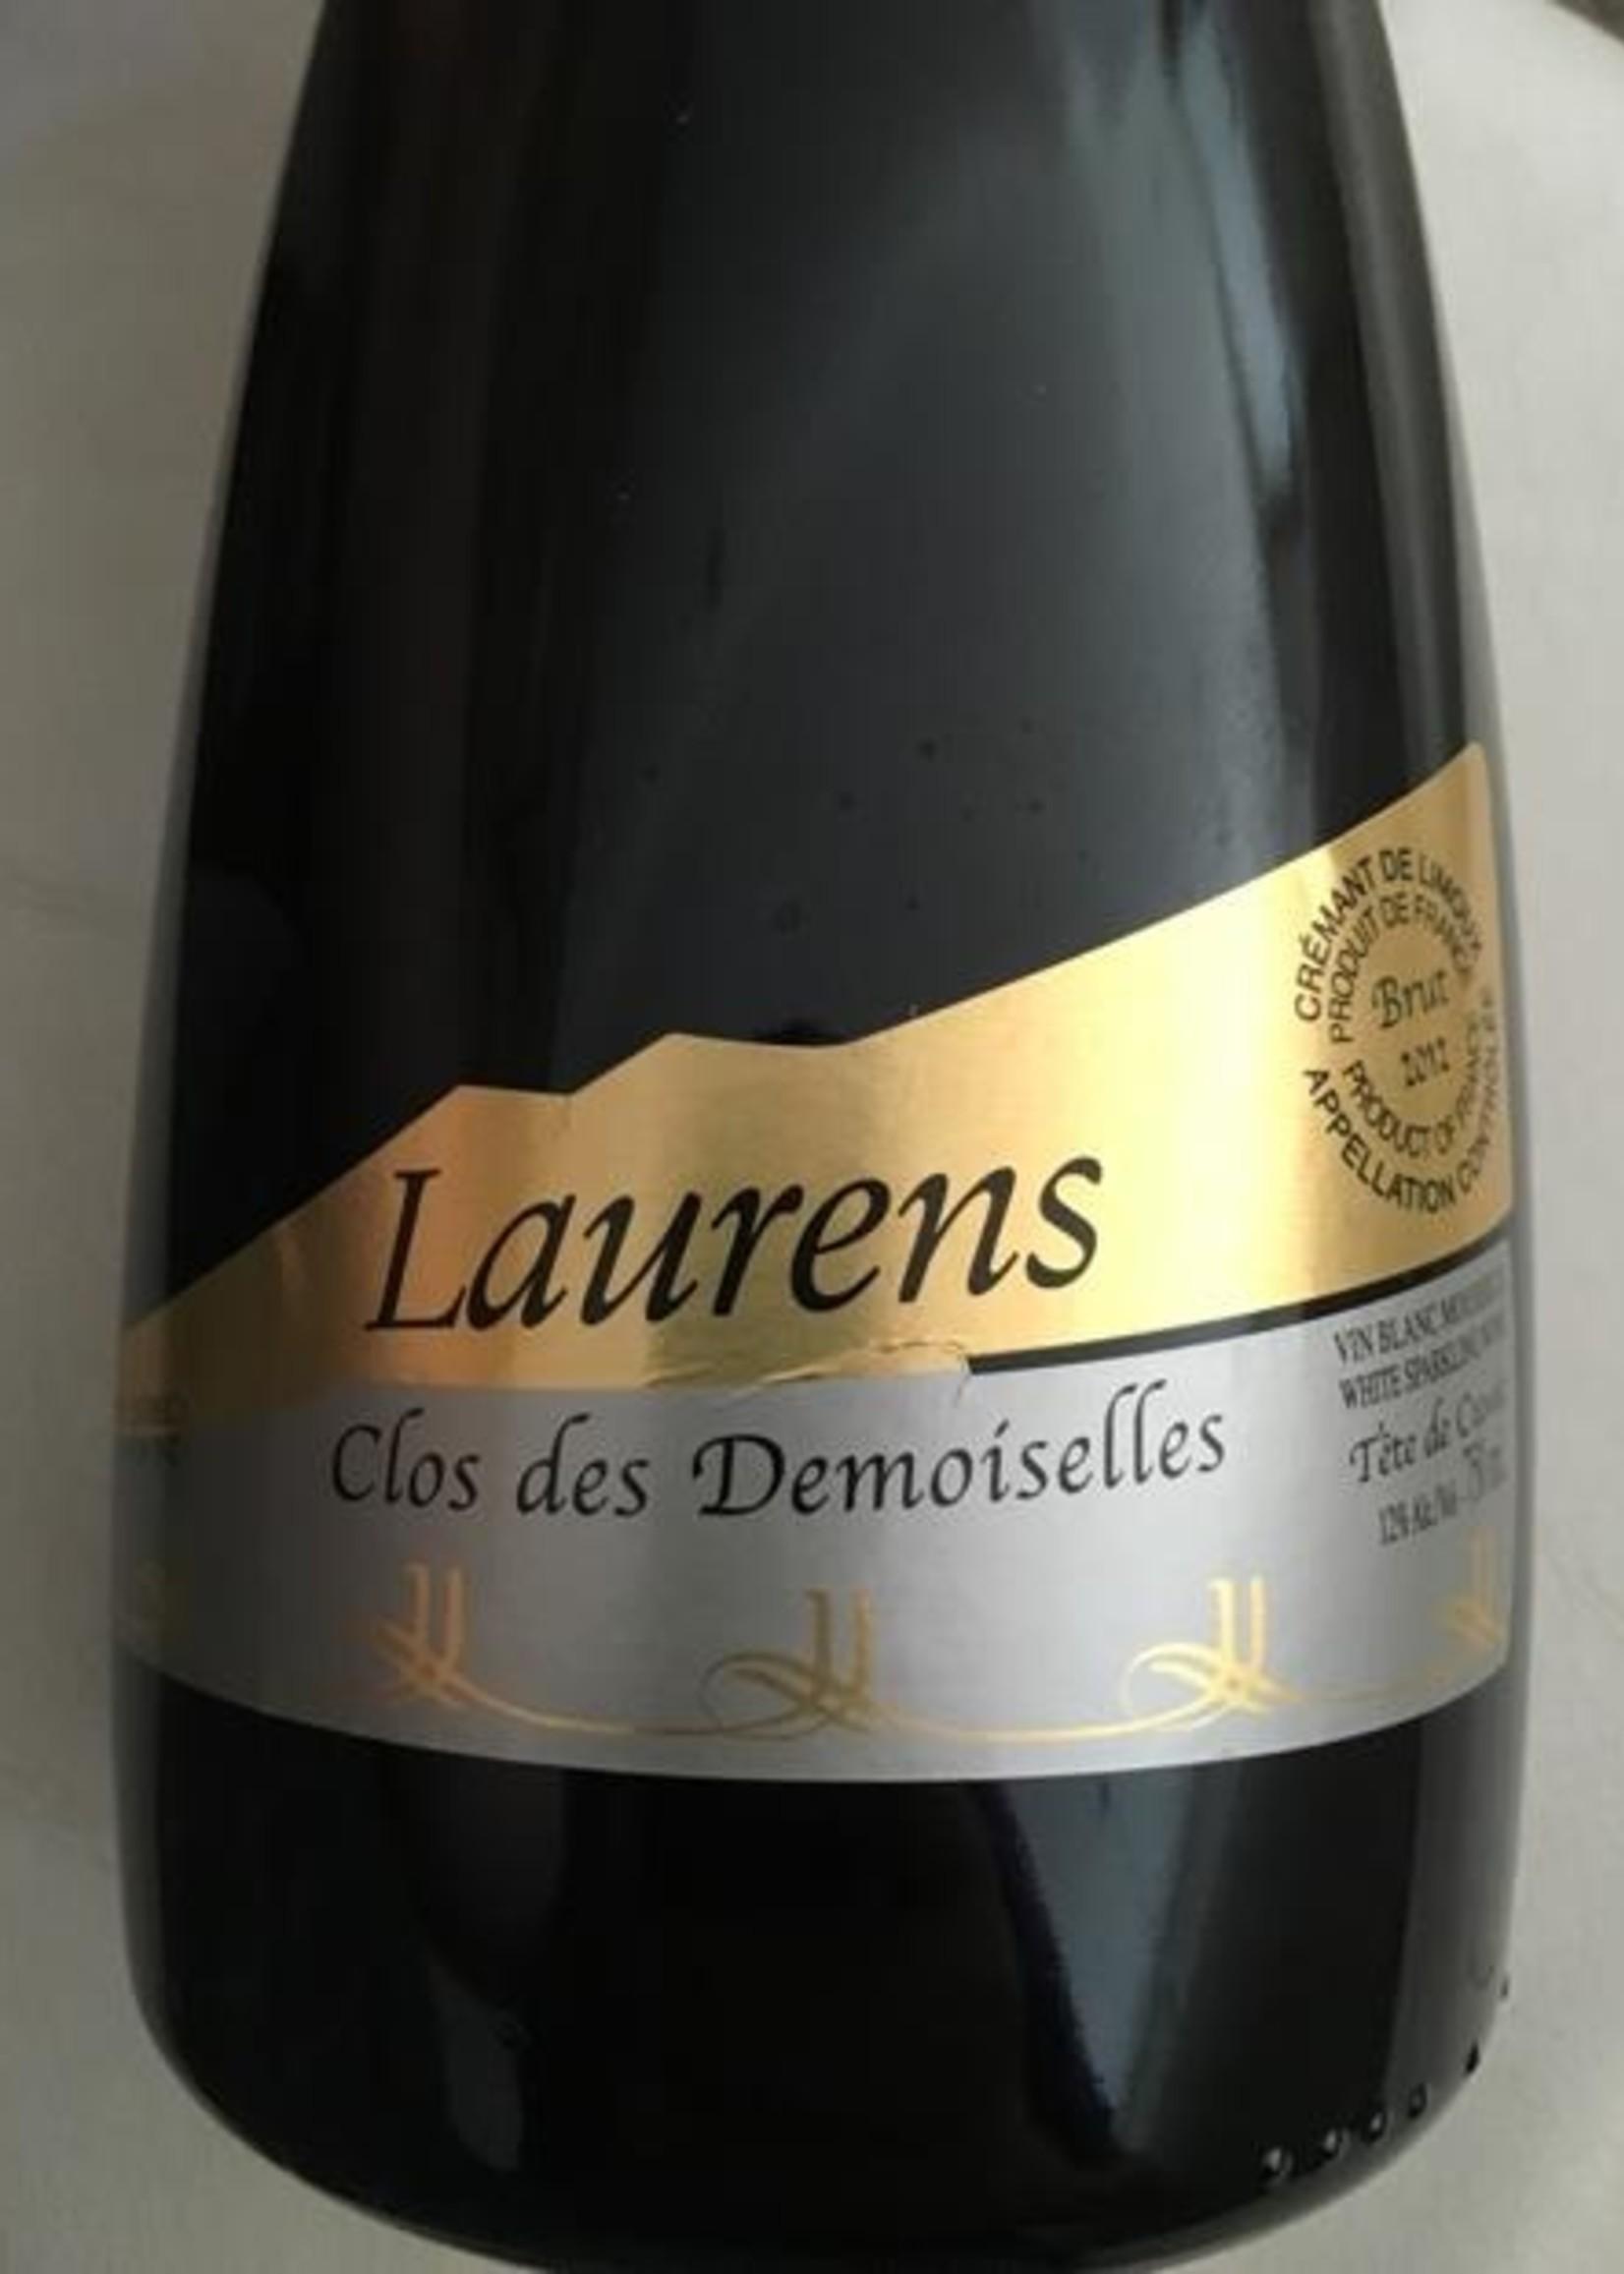 J. Laurens Les Clos de Demoiselles Brut